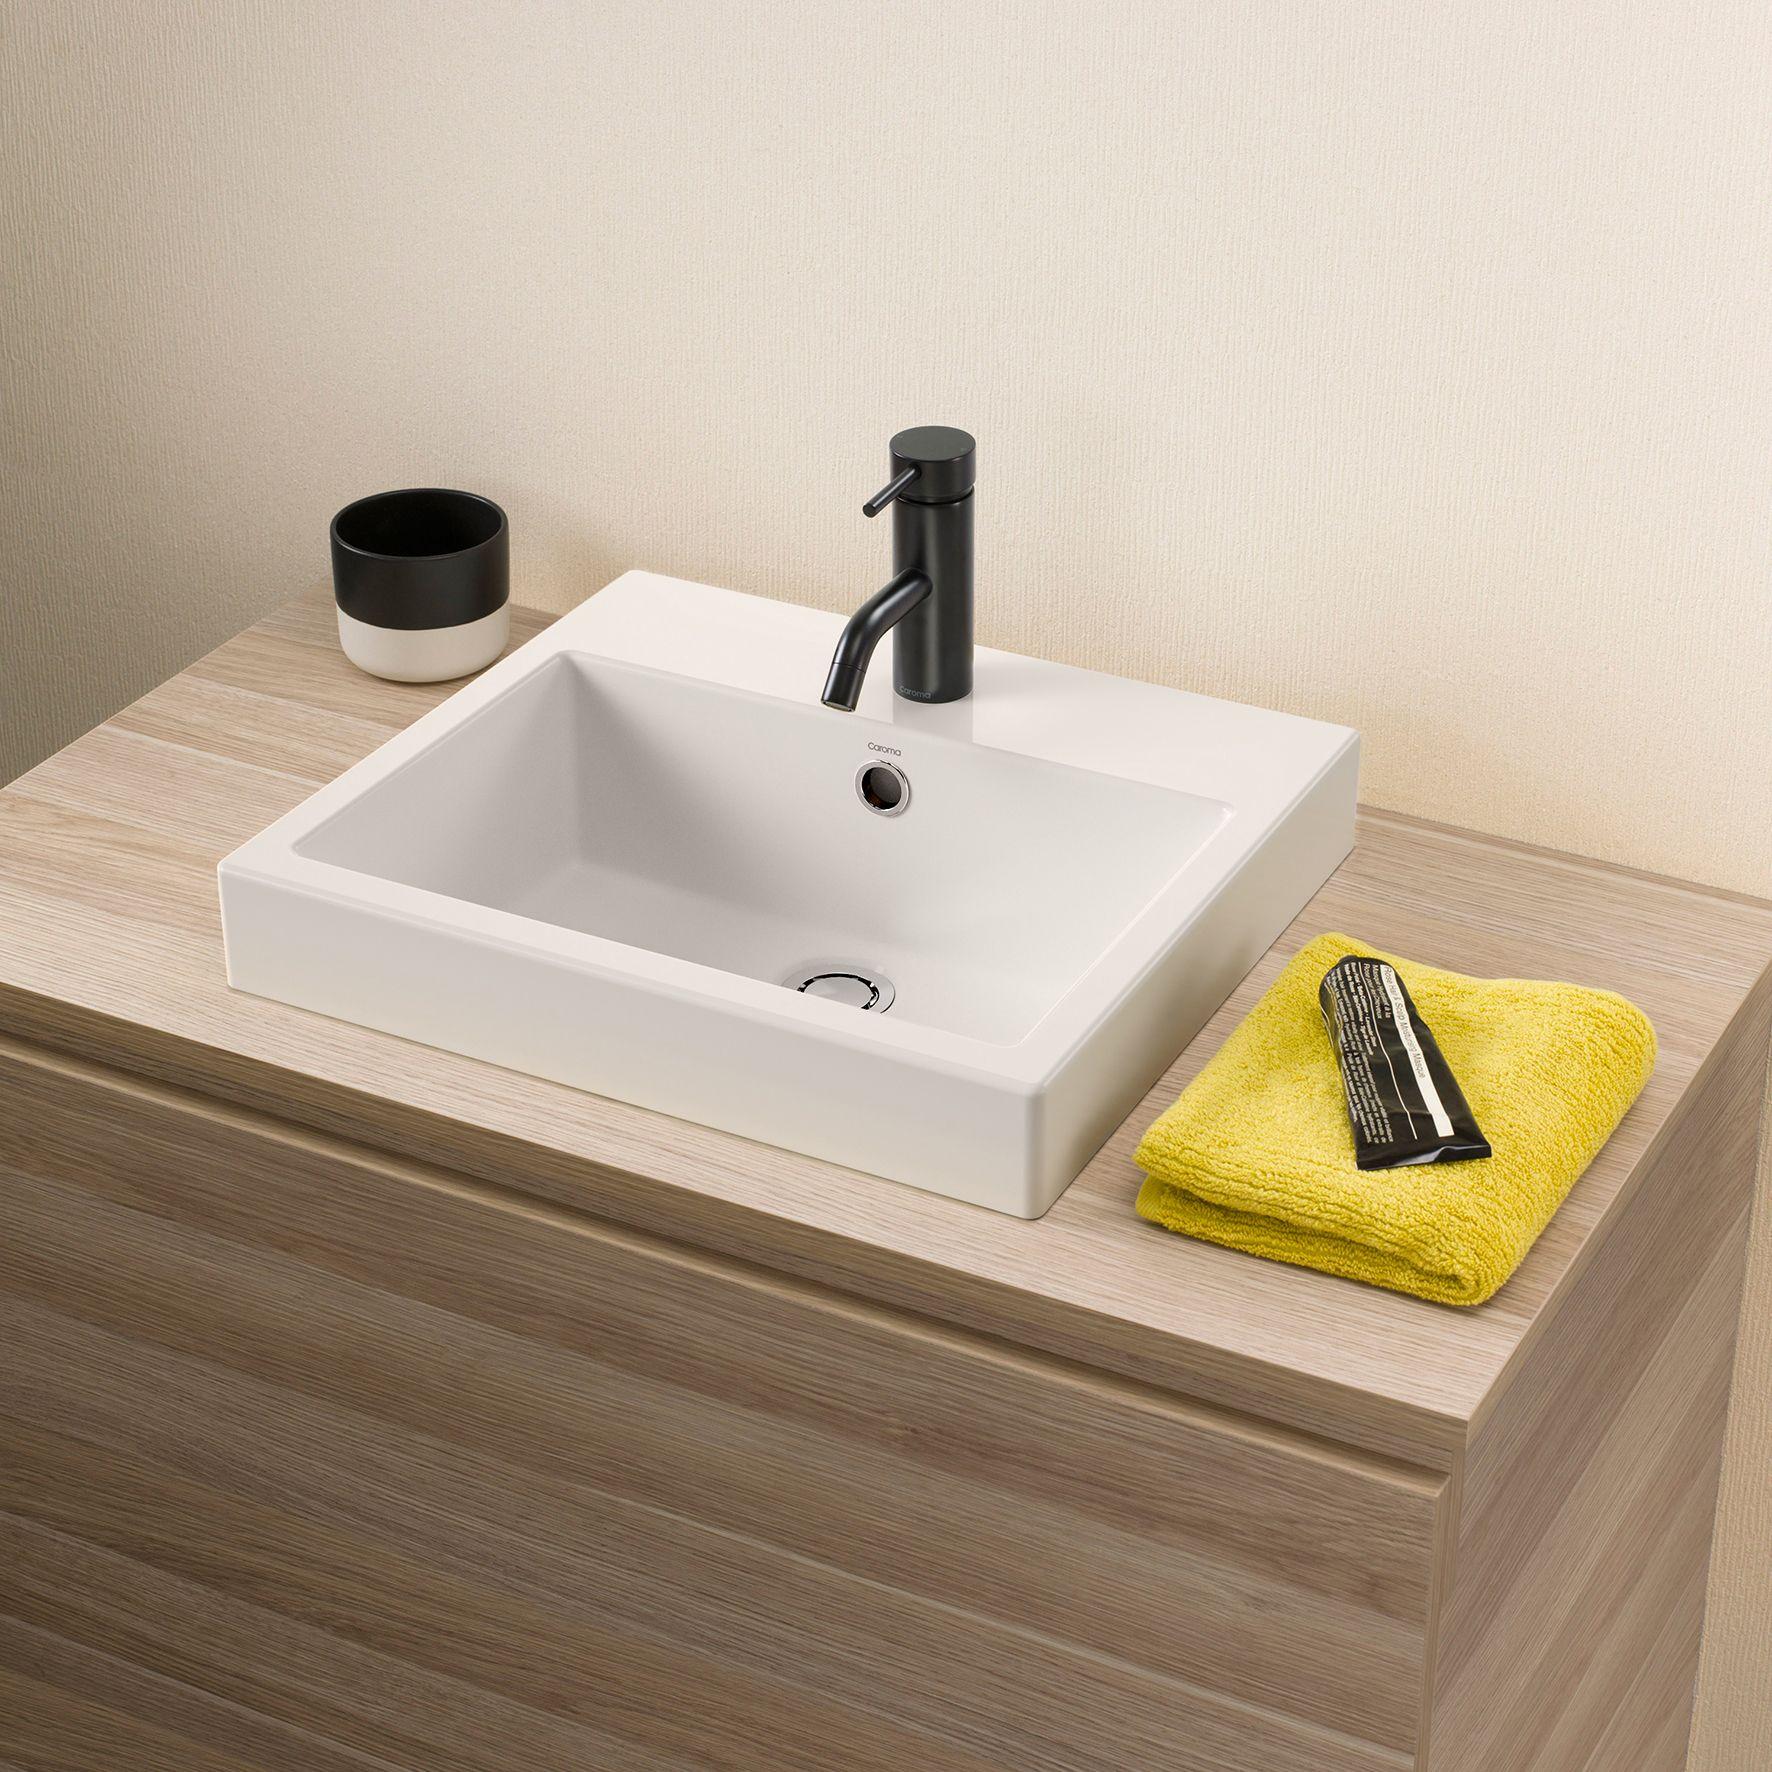 Switch It Up! Try Something New In Your Bathroom   Black Tapware. Caroma  Liano · Bathroom BlackBathroom LaundryBathroom BasinBathroom ...